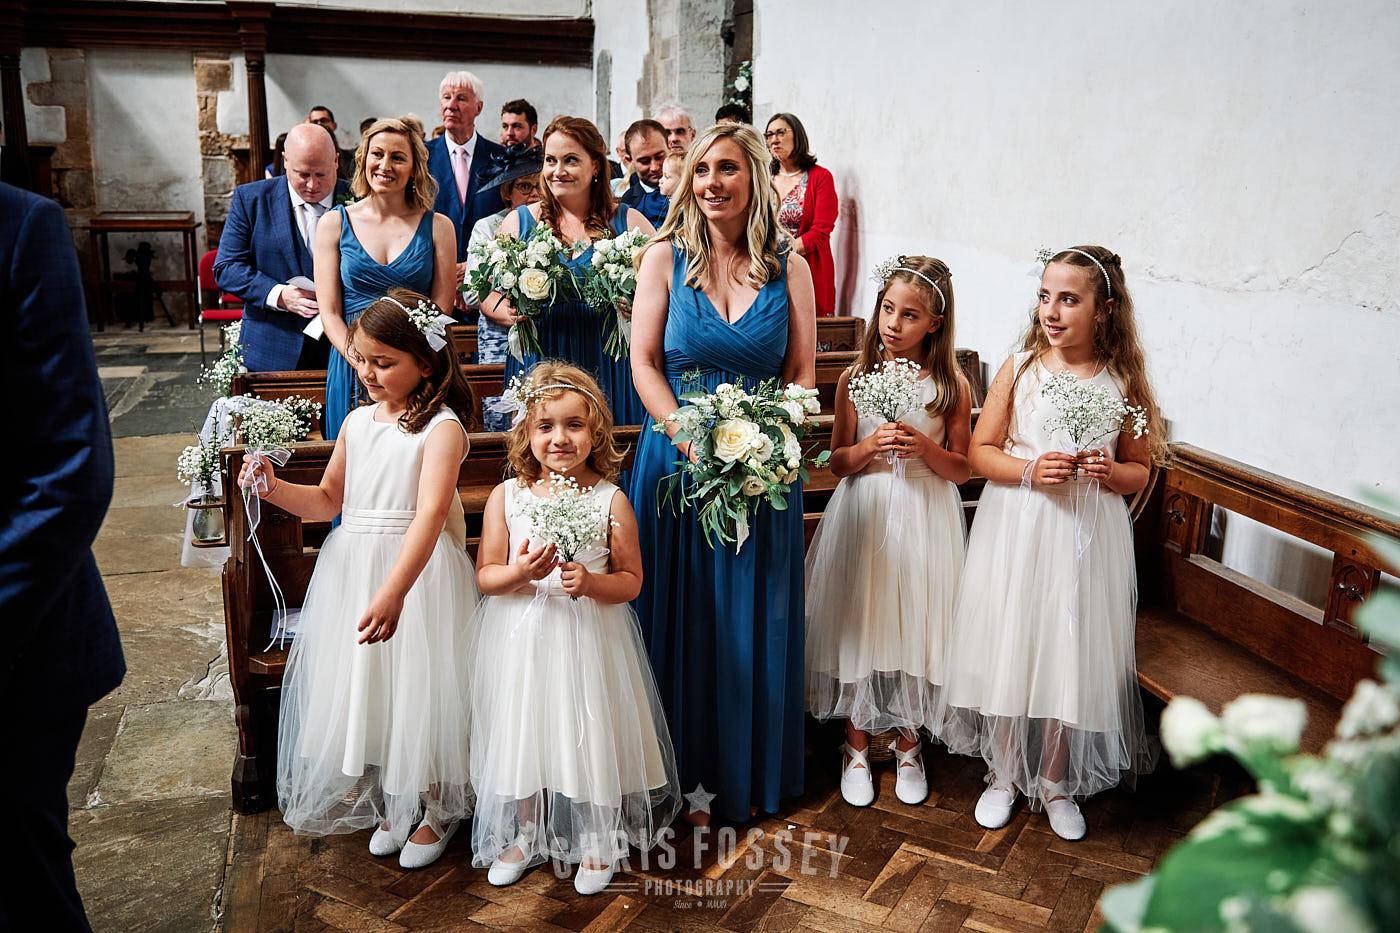 Ragley Hall Wedding Photography Chris Fossey Warwickshire Photographer